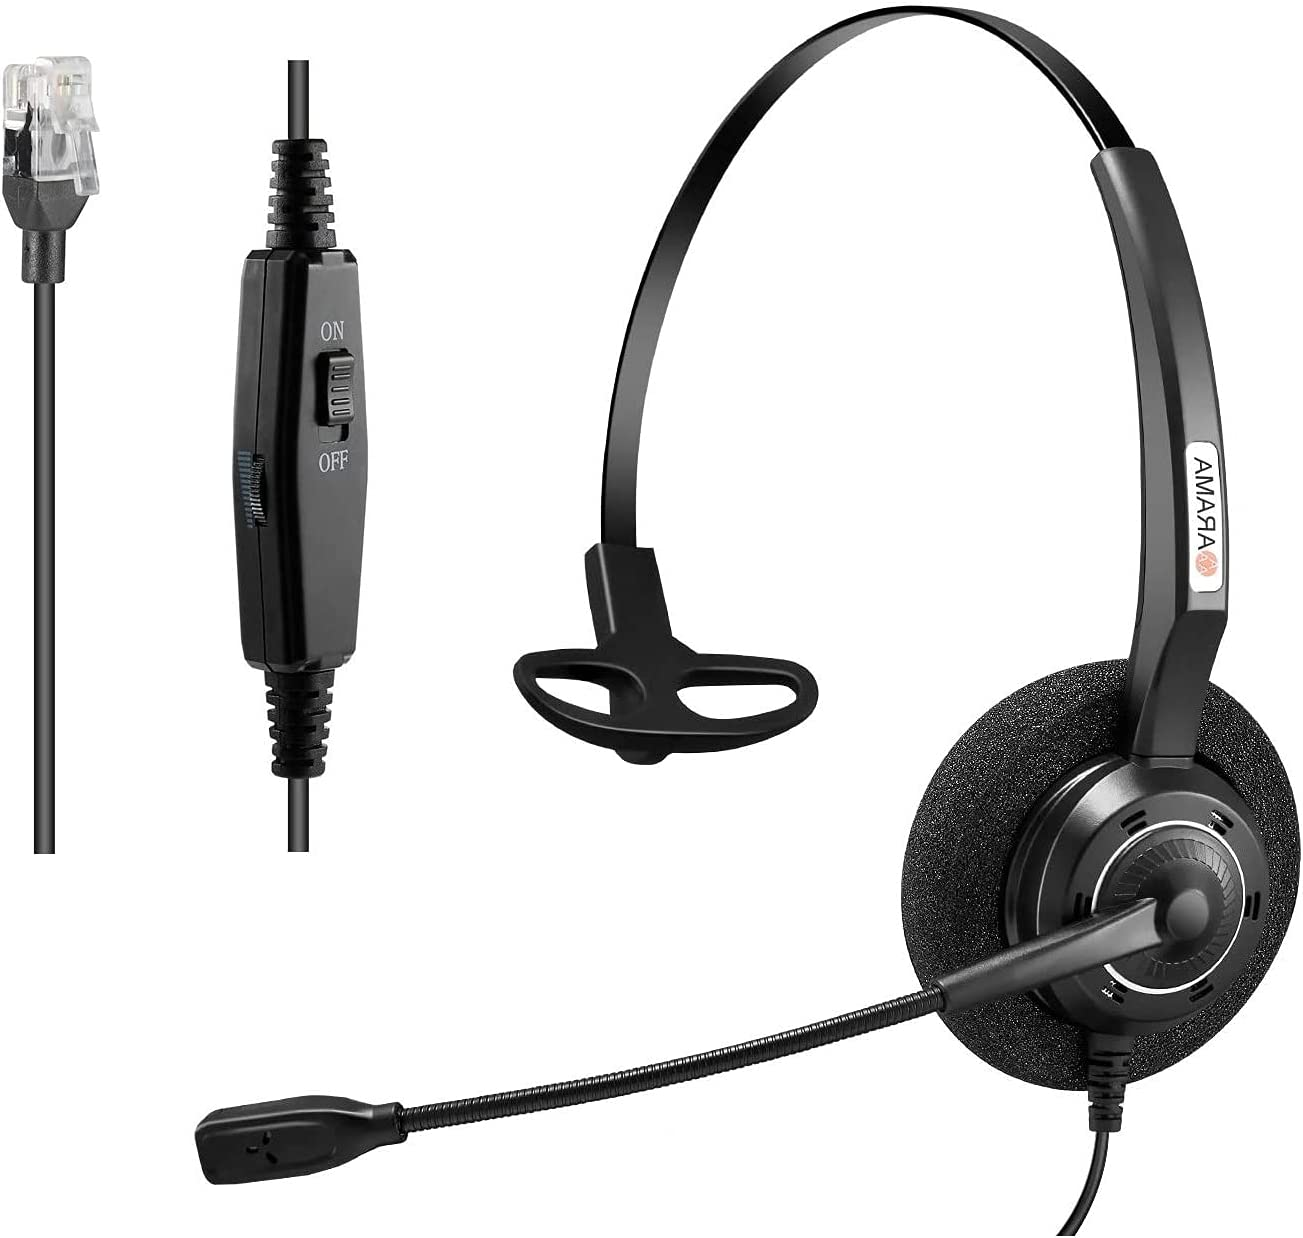 Arama Phones Headset RJ9 with Pro Noise Canceling Mic and Mute Switch Wired Office Headset Compatible with Polycom Mitel Plantronic ShoreTel Avaya Zultys Toshiba NEC Aspire Nortel Landline Phones